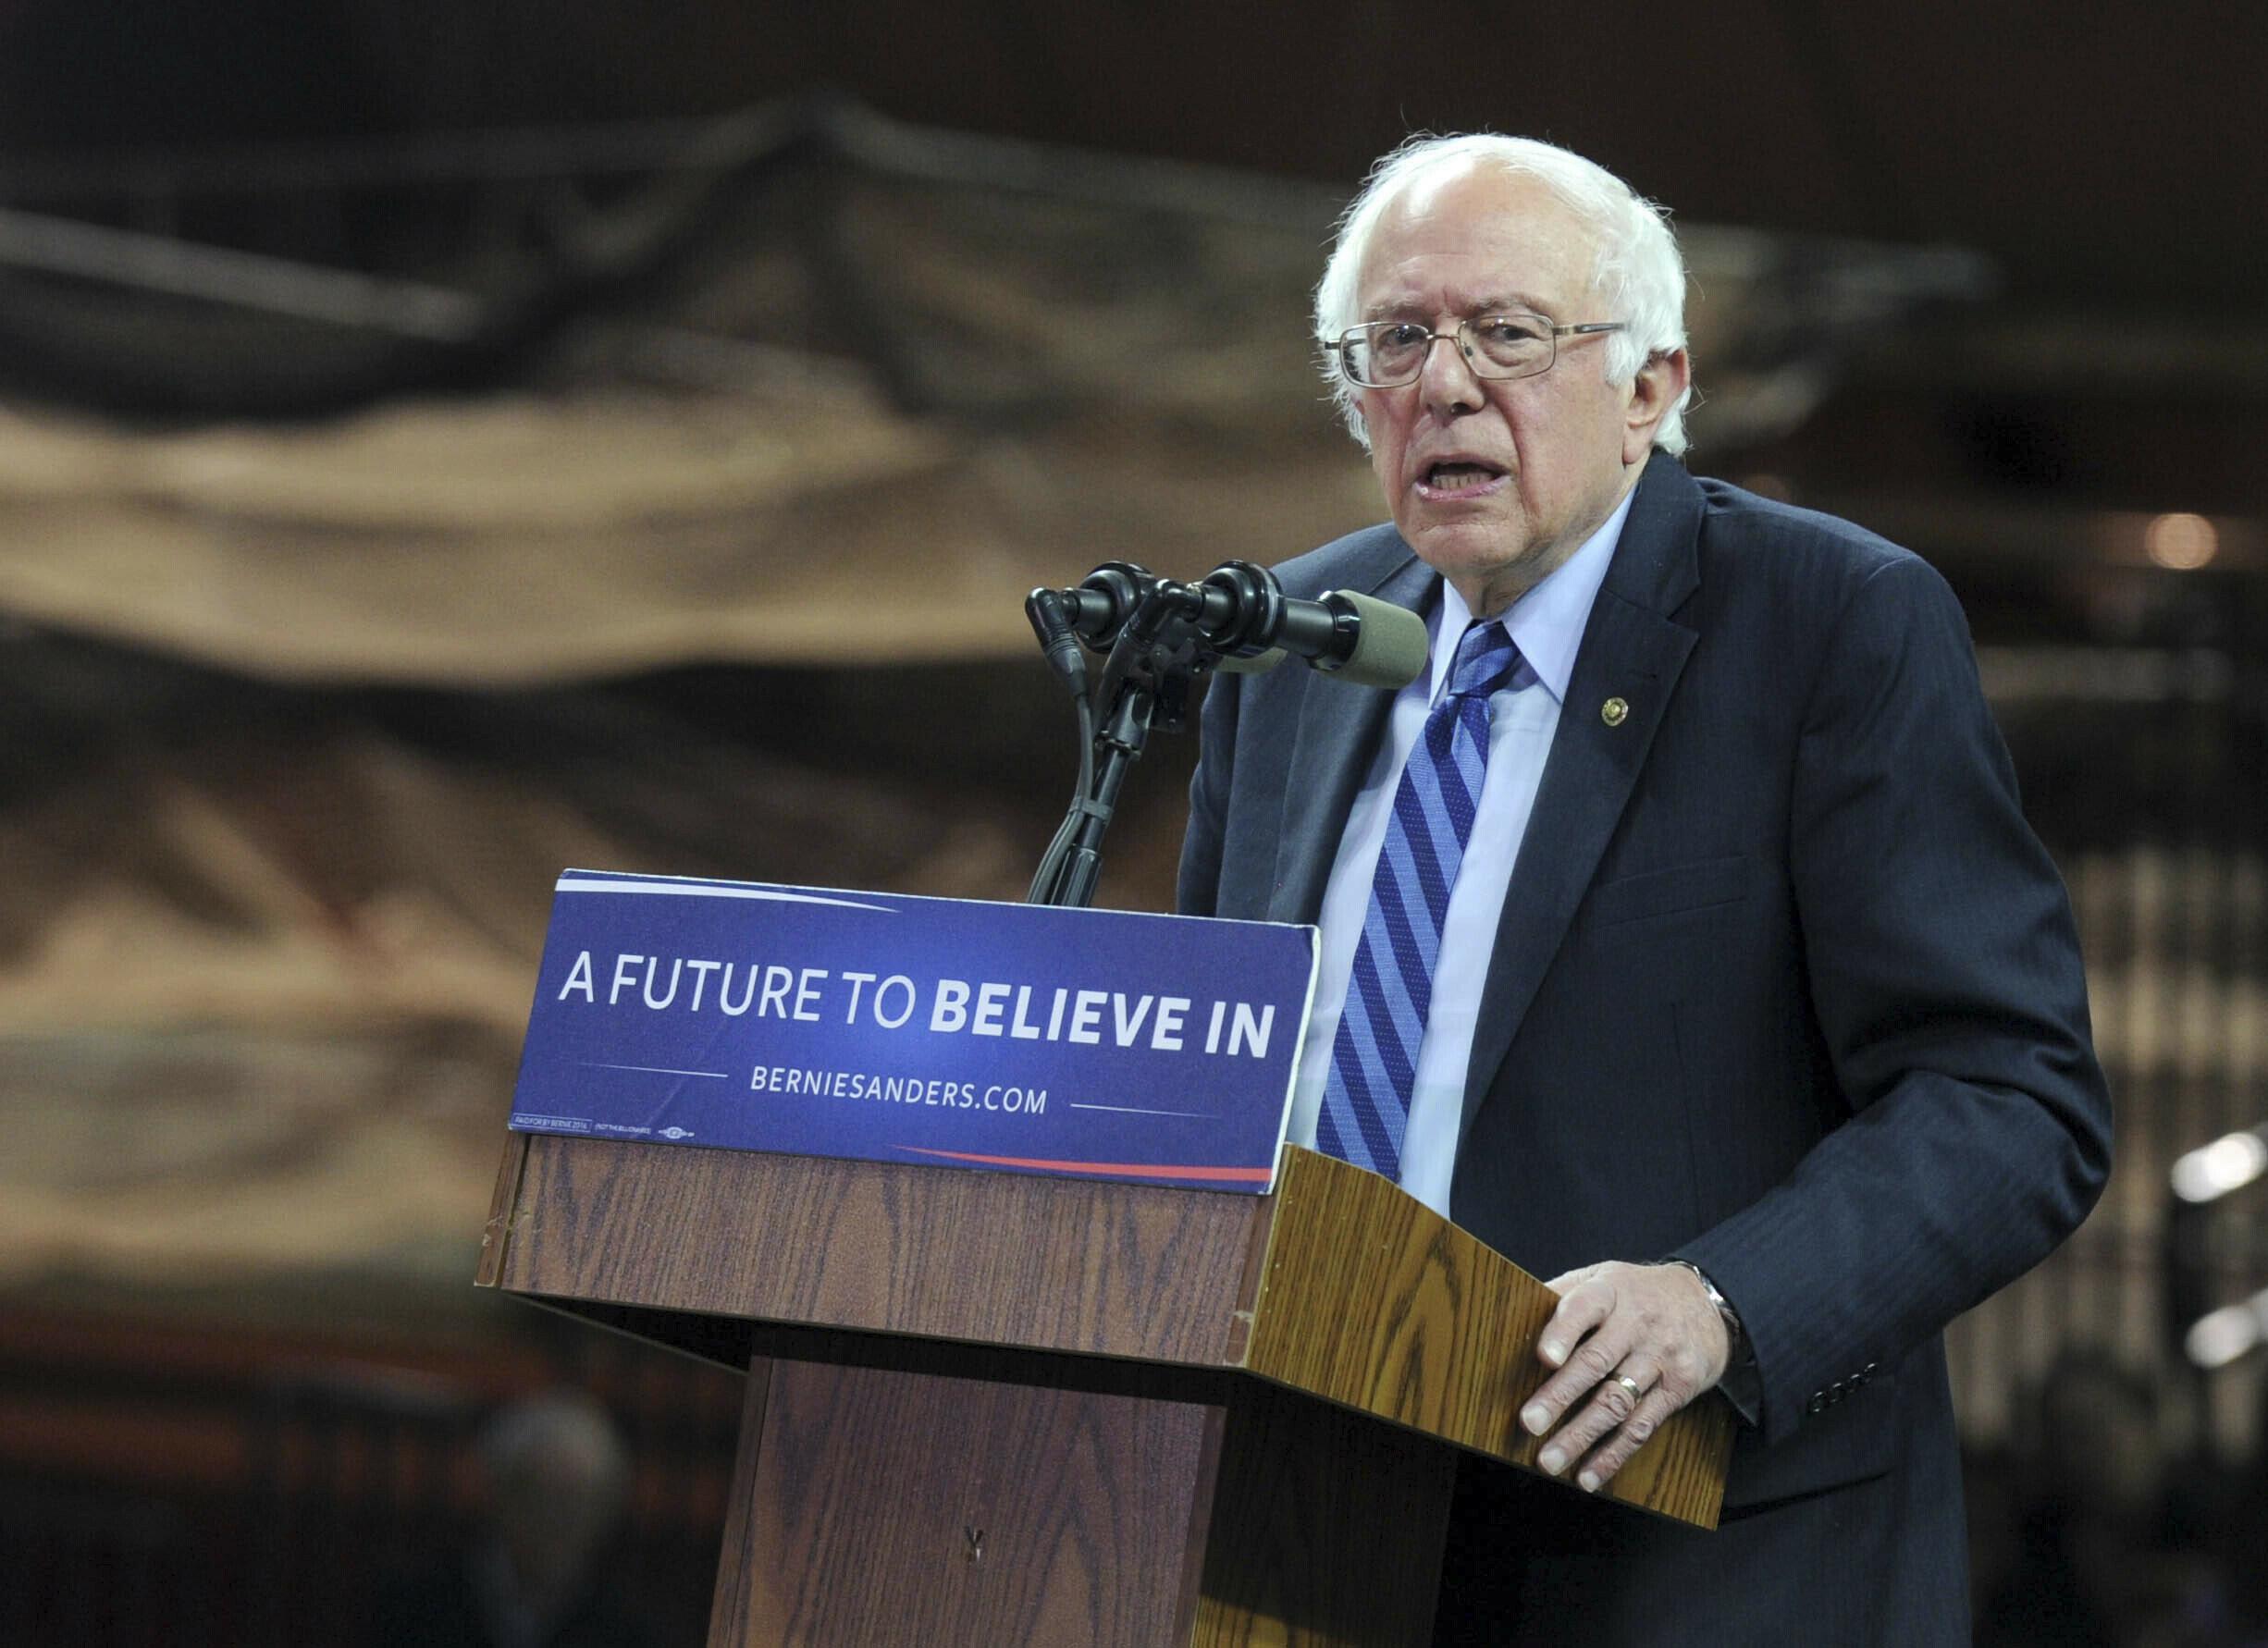 "Photo by: Dennis Van Tine/STAR MAX/IPx 5/8/16 Bernie Sanders at Bernie Sanders ""A Future to Believe In"" Rally. (New Brunswick, New Jersey)"